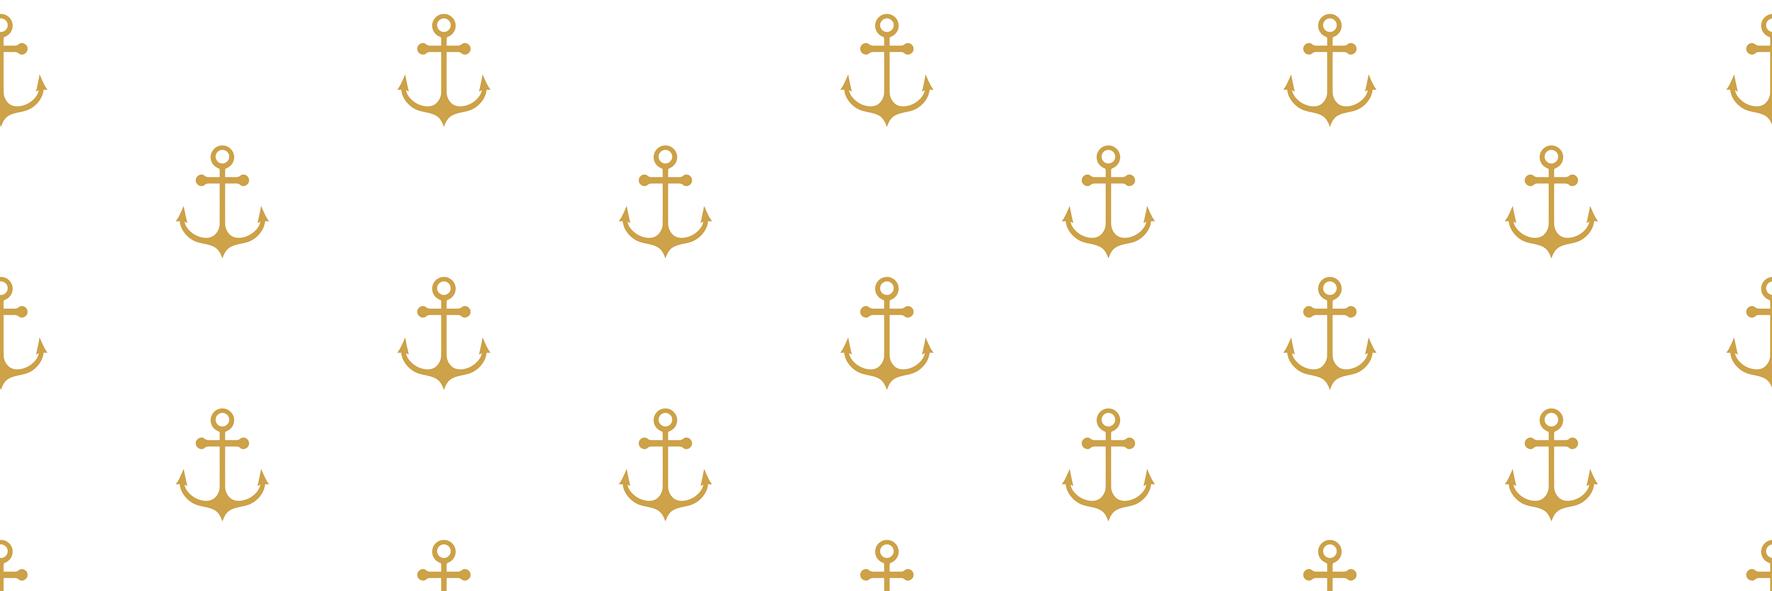 org slide image